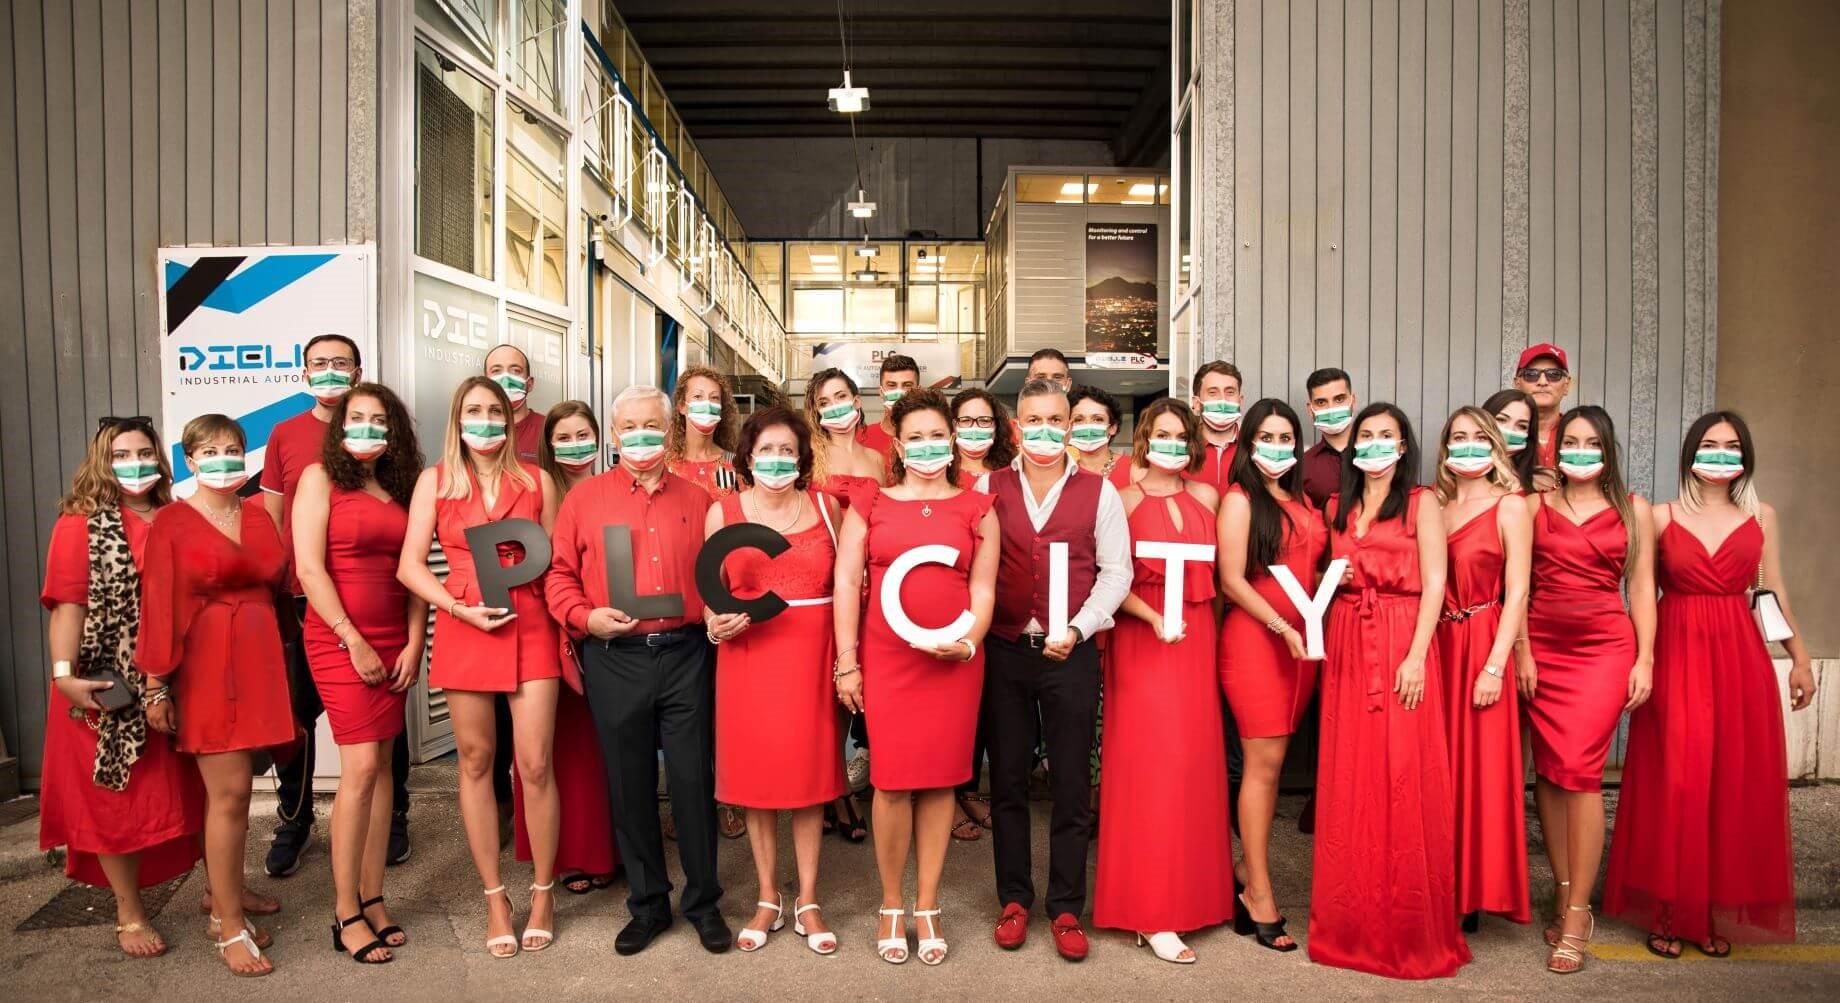 PLC-CITY Team